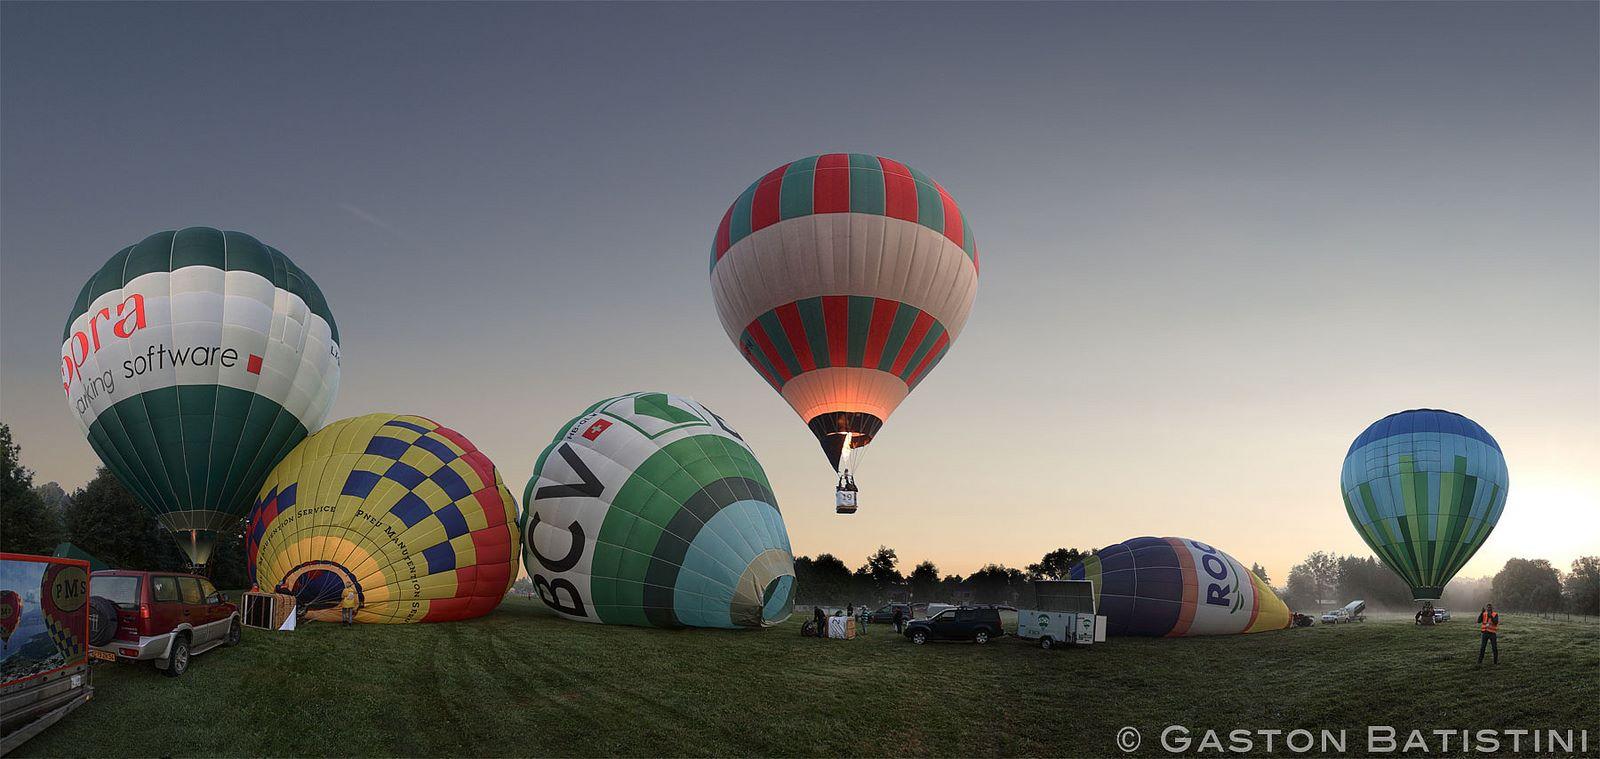 Weekend 21-23 augustus - Hottolfiades: le 20ste editie van heteluchtballonnen festival